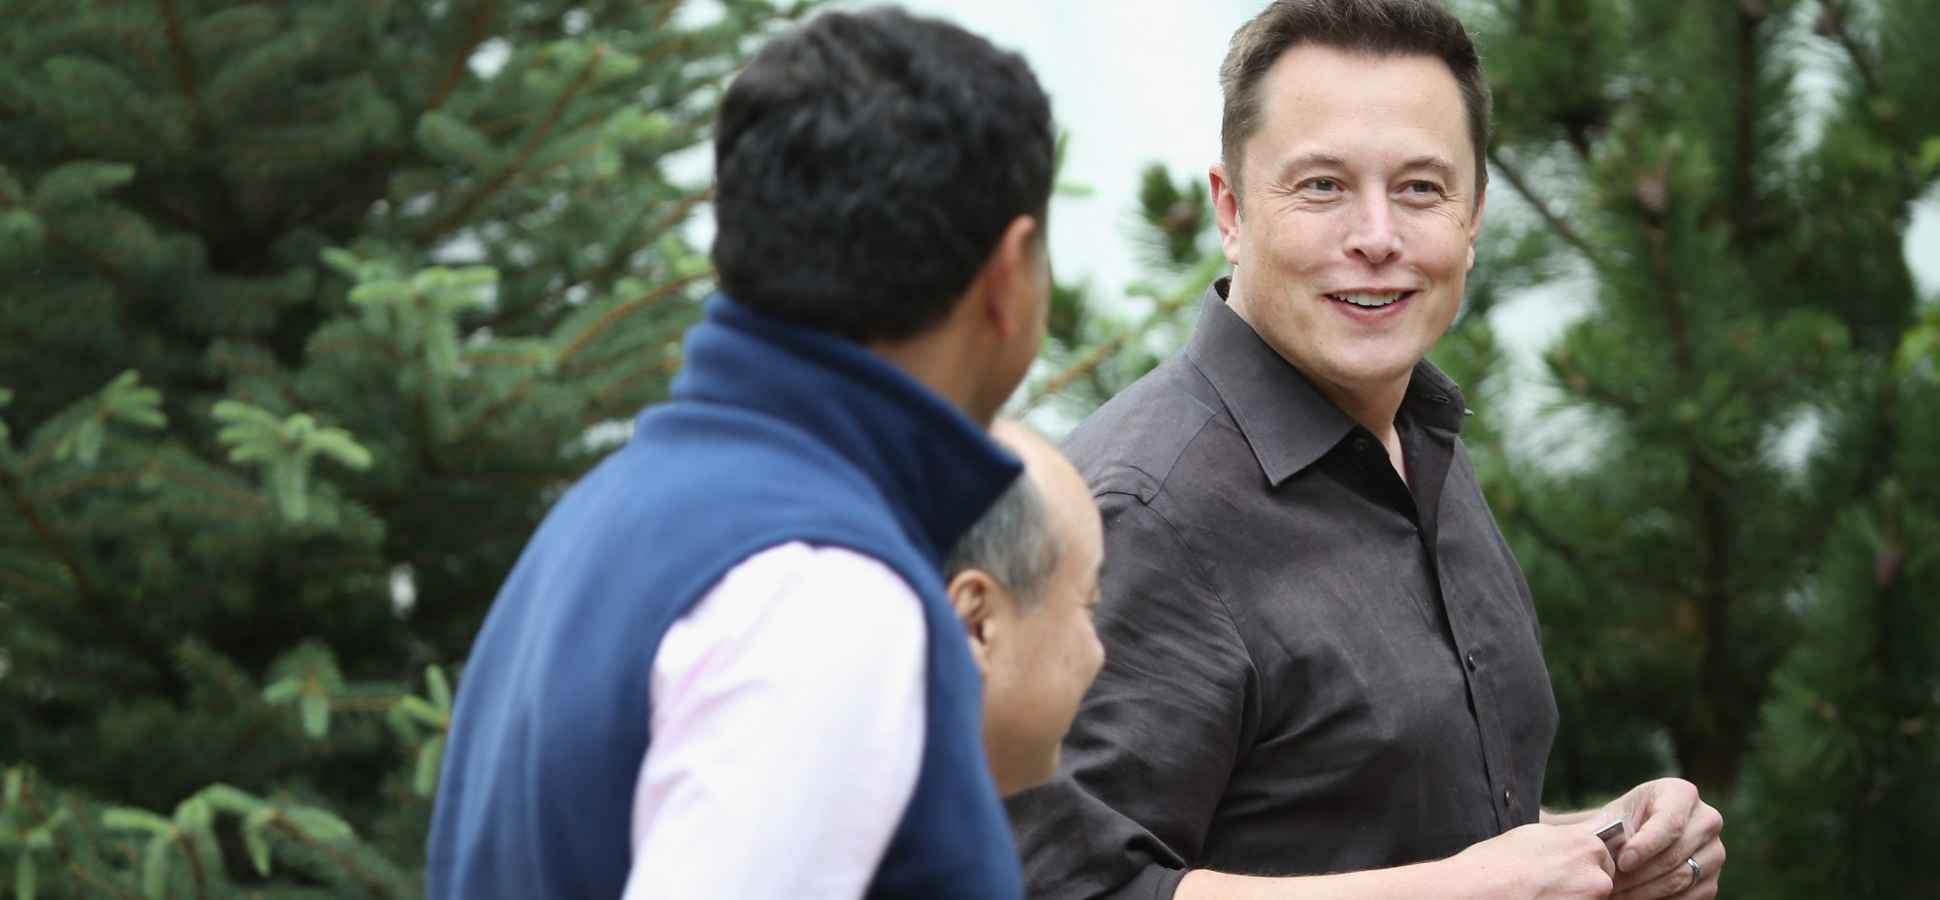 Elon Musk's Top 4 Entrepreneurial Traits